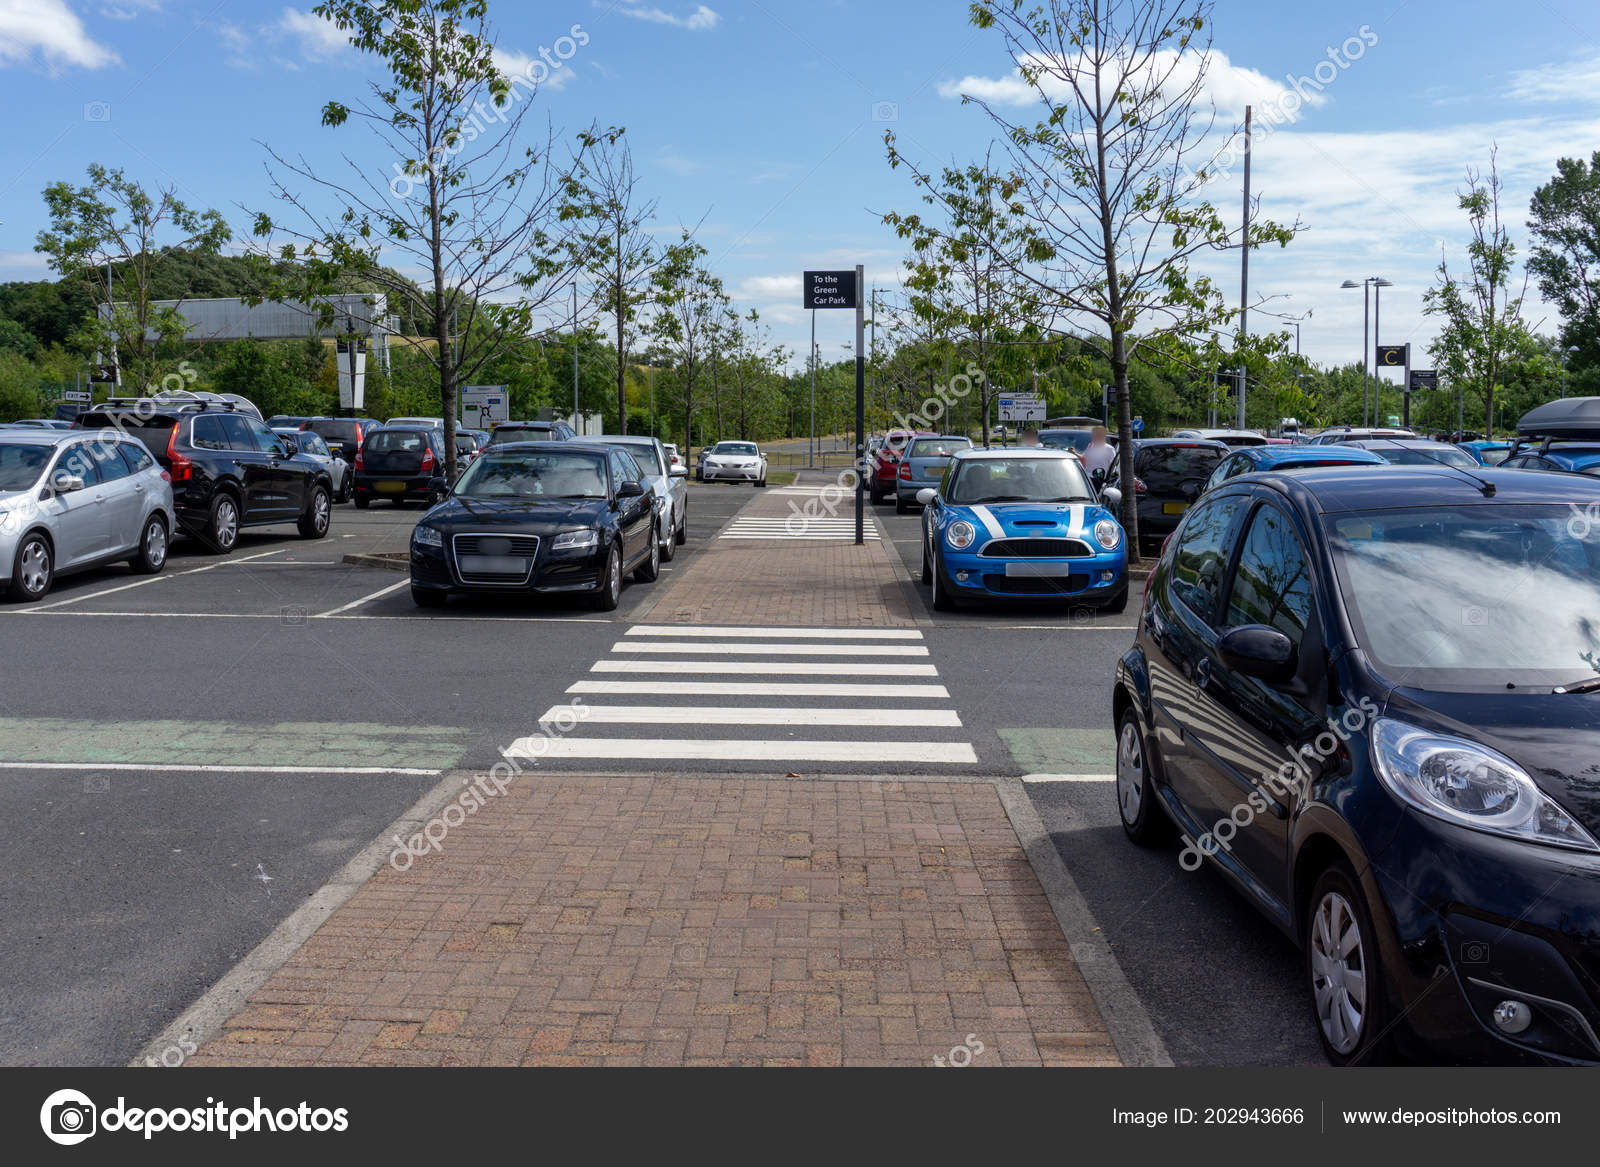 Straight Pedestrian Walkway Carpark Cars Parked Both Sides Stock Editorial Photo C Mcdowalljh 202943666